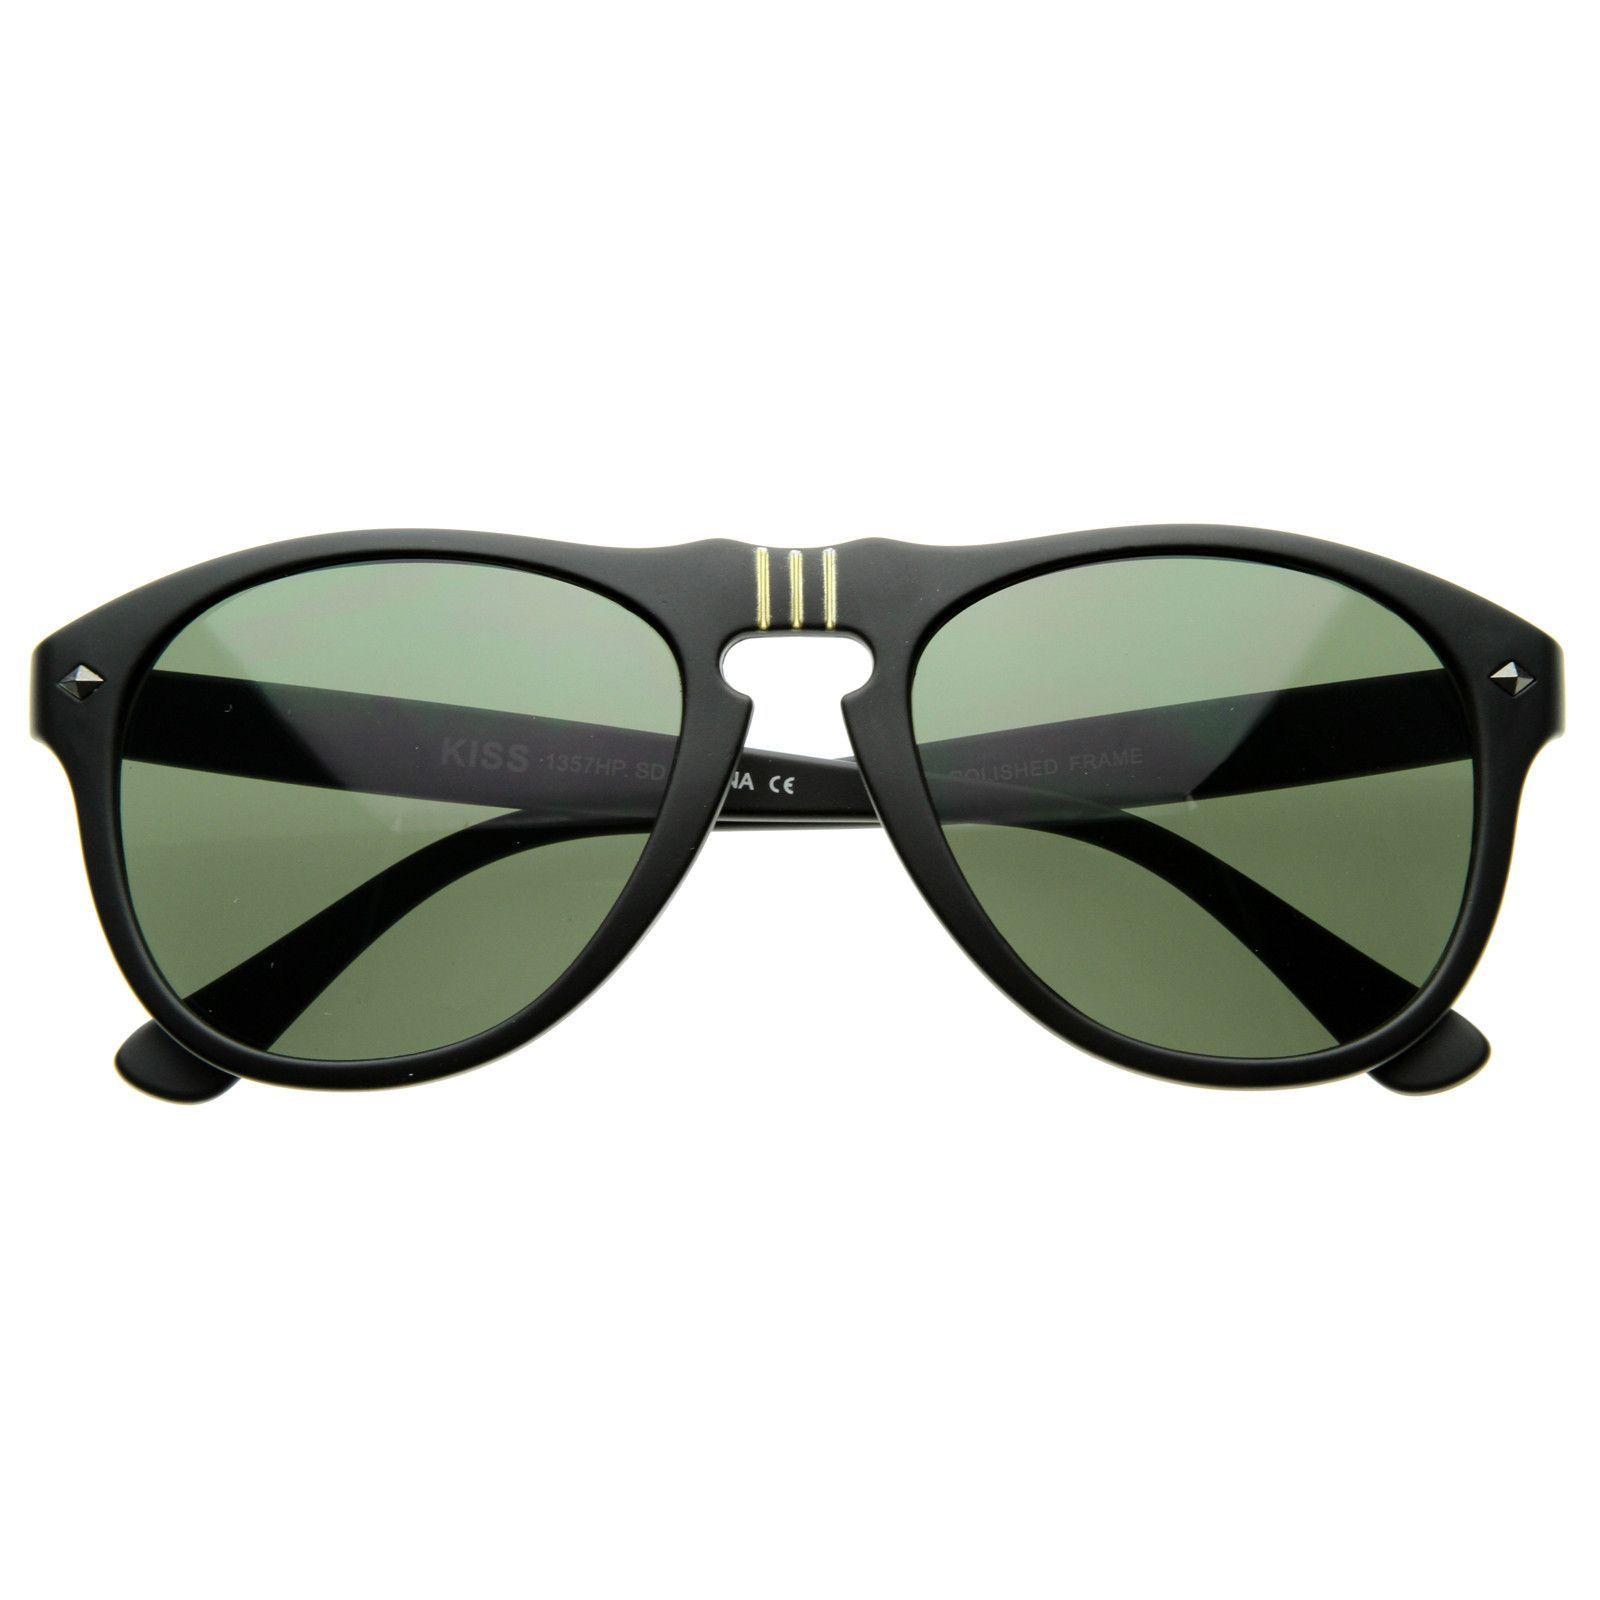 Mens Celebrity Ryan Gosling European Retro Aviator Sunglasses 8168